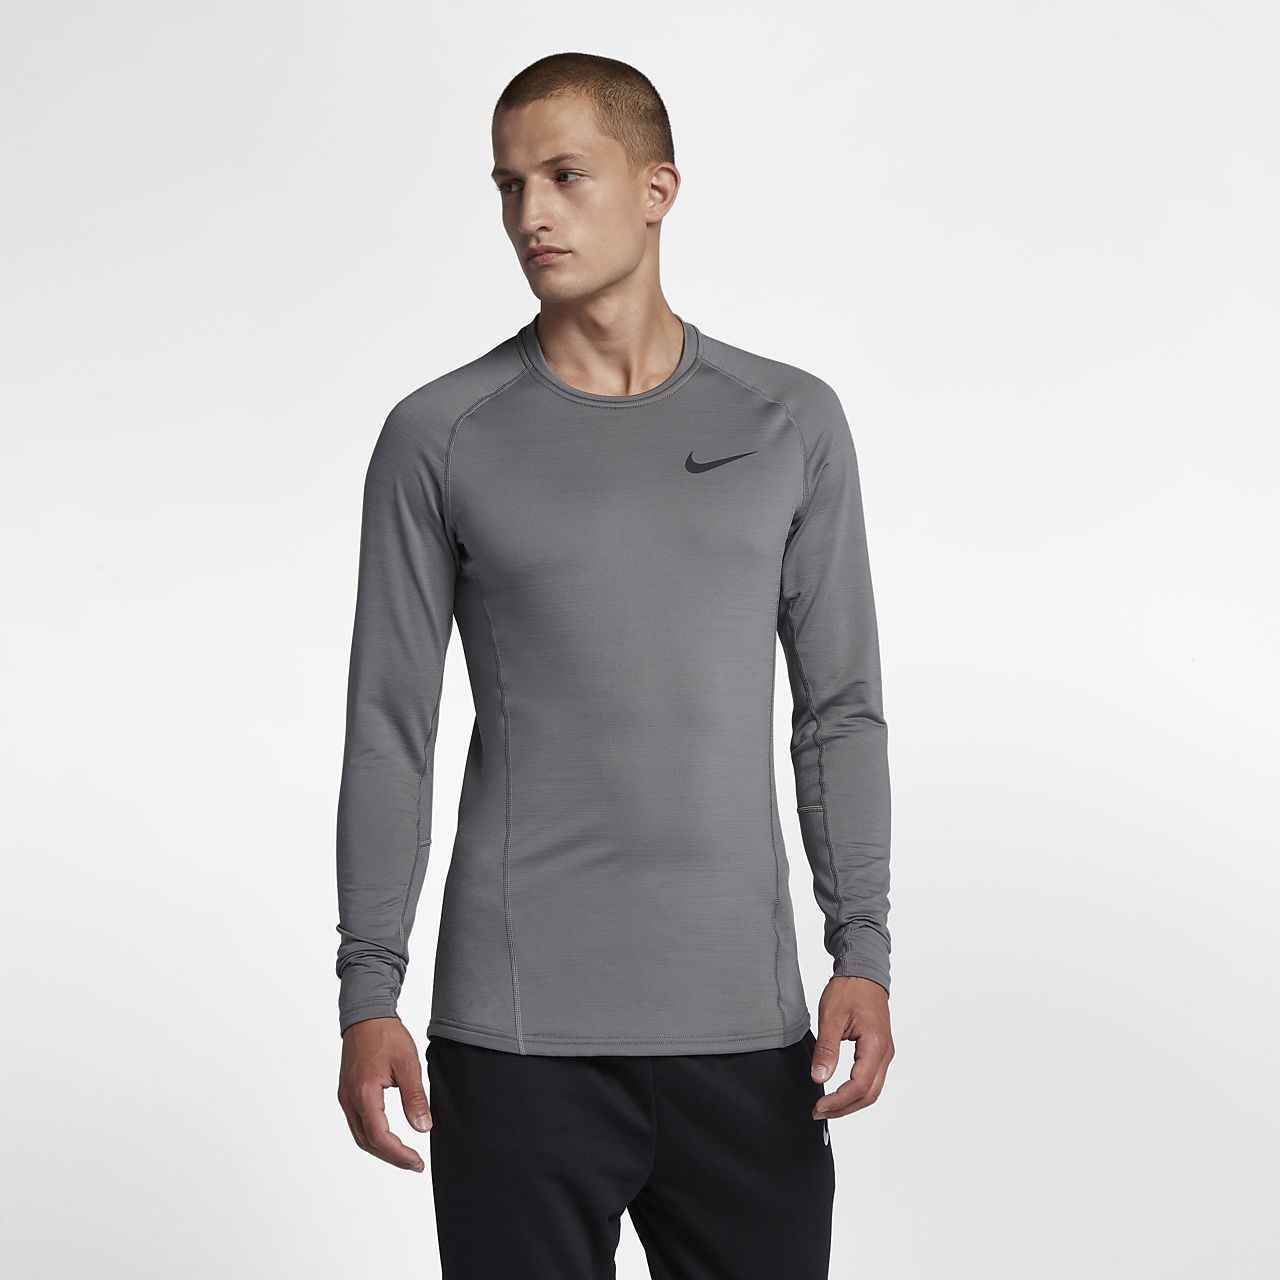 Nike Pro Warm langermet overdel til herre